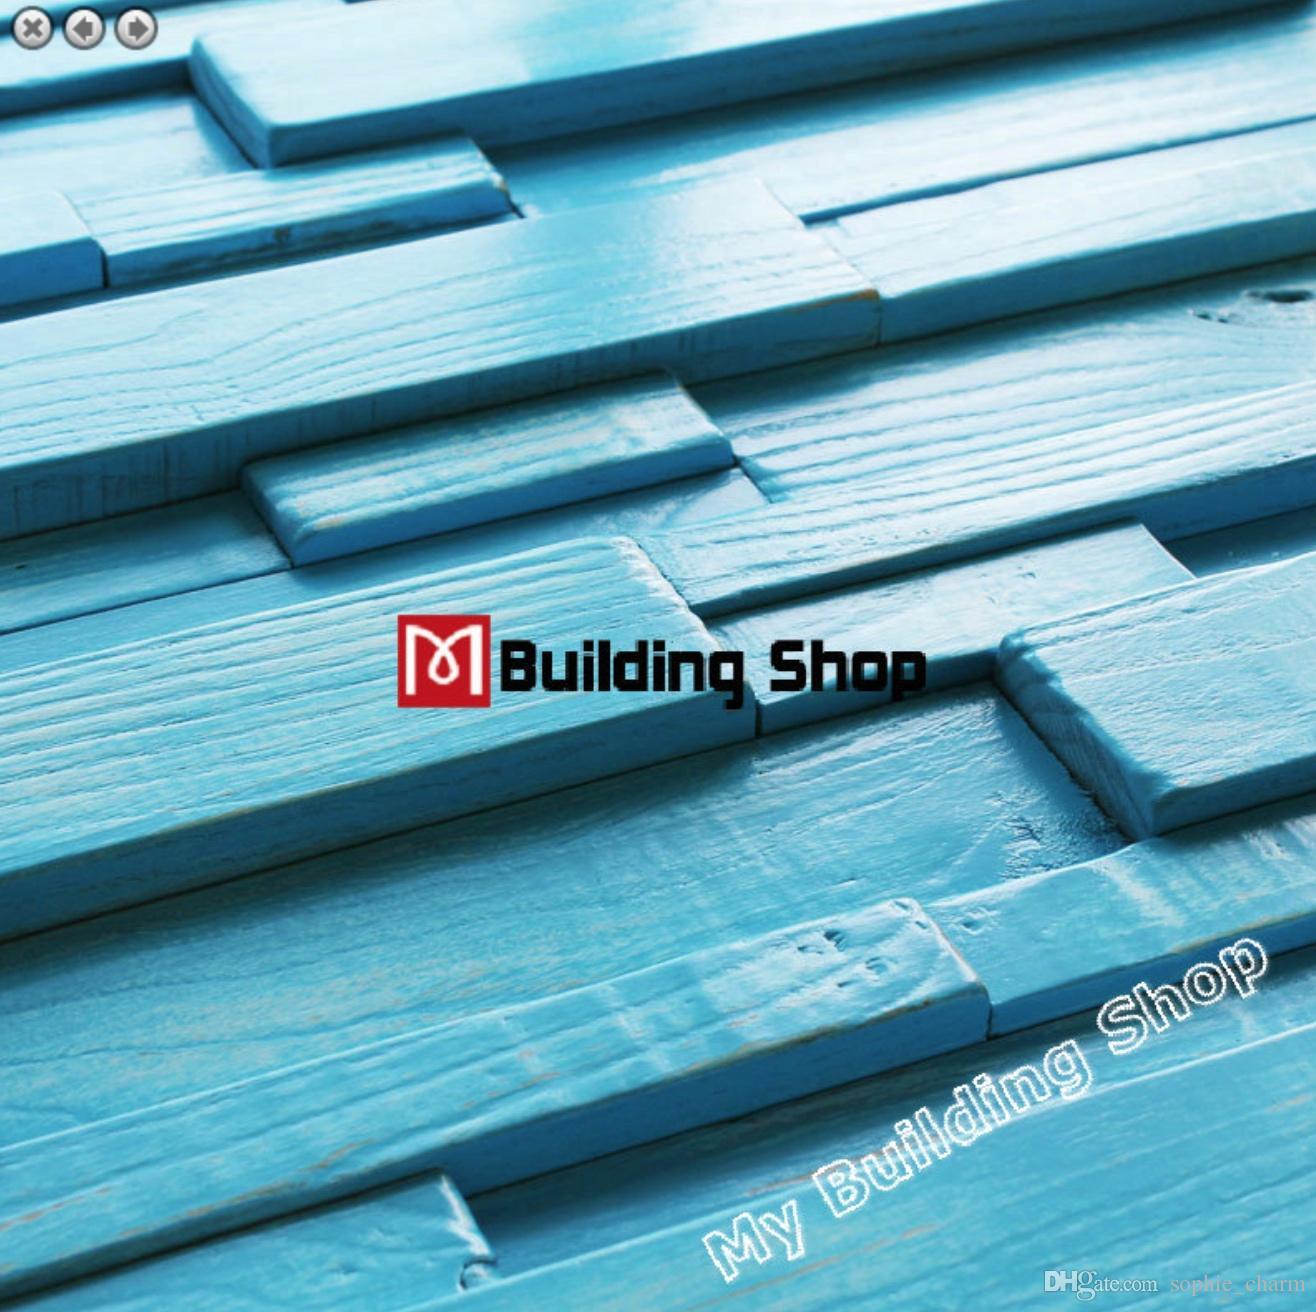 Tremendous 30X60Cm Blue Mosaic Tile 3D Wood Mosaic Backsplash Tile Backsplash Nwmt180 Ancient Wood Tiles Natural Wood Pattern Kitchen Tiles Home Interior And Landscaping Synyenasavecom